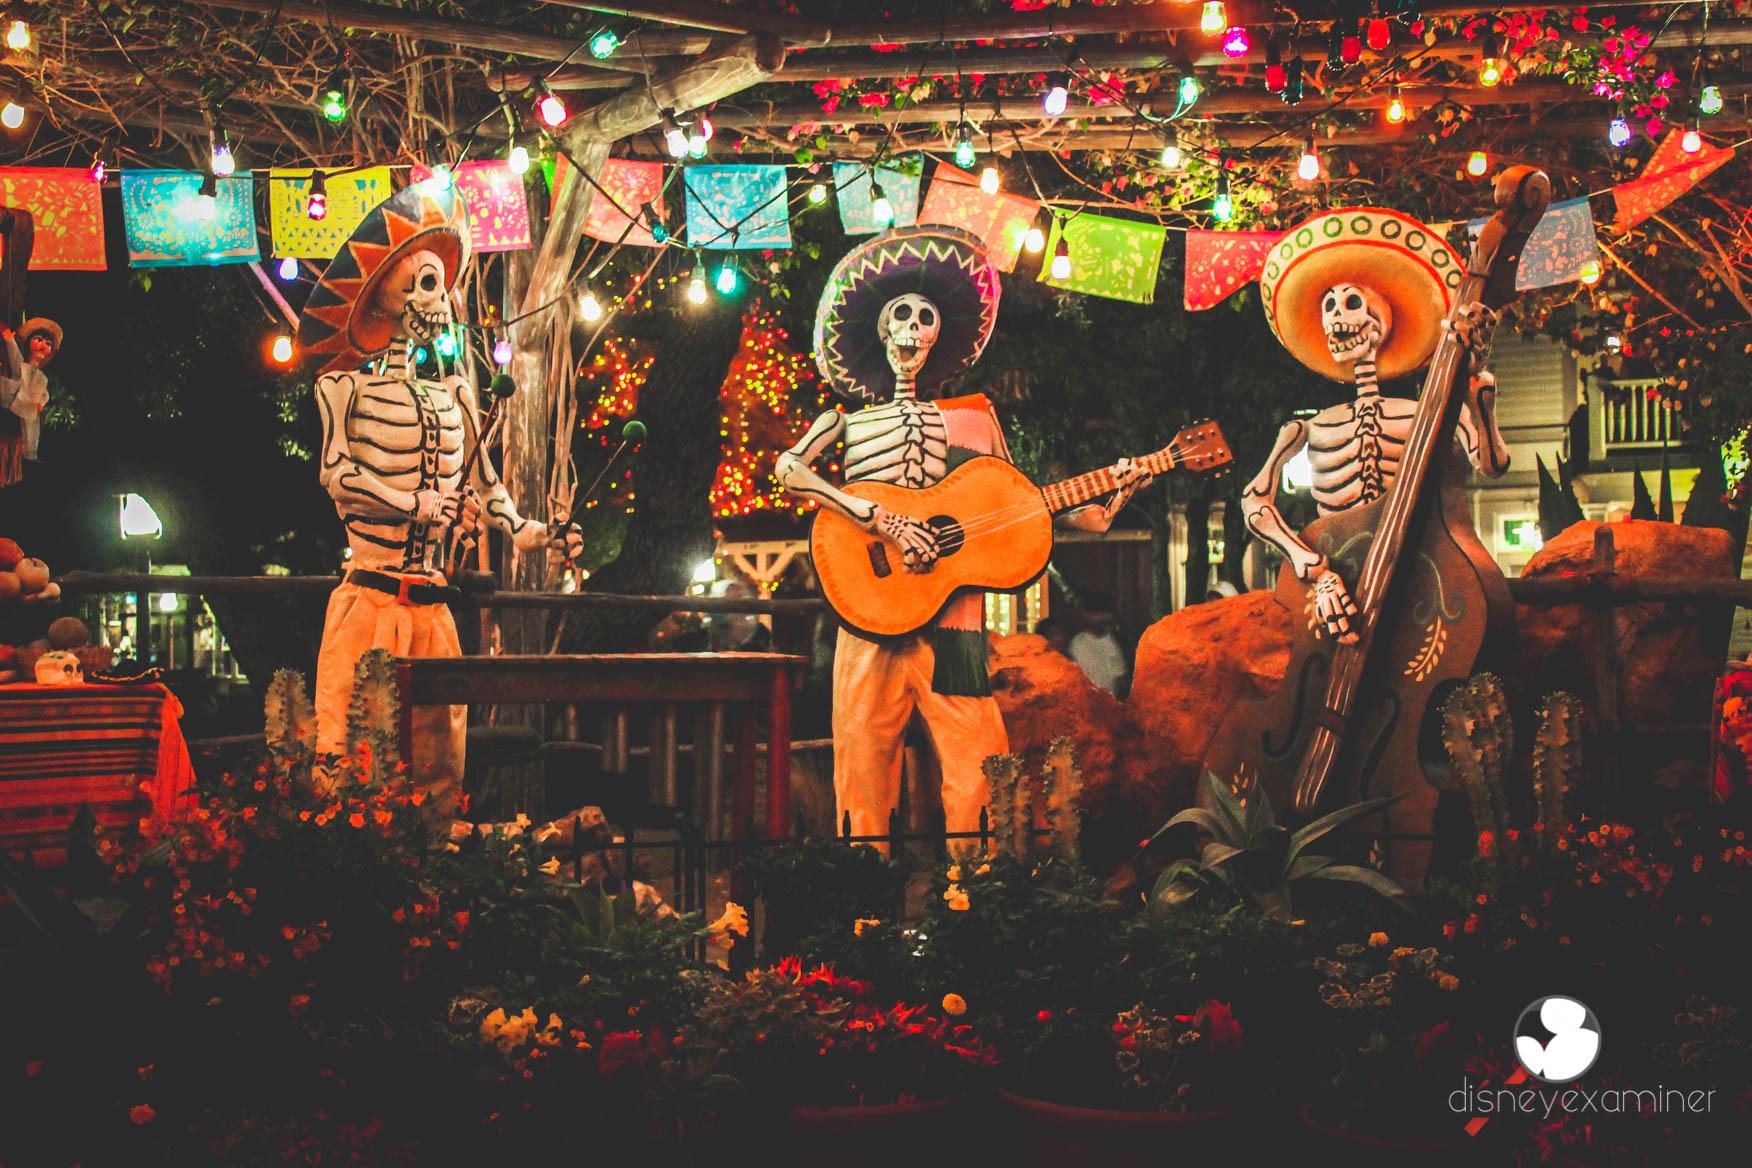 dia de los muertos wallpaper,music,musician,performance,stage,guitarist